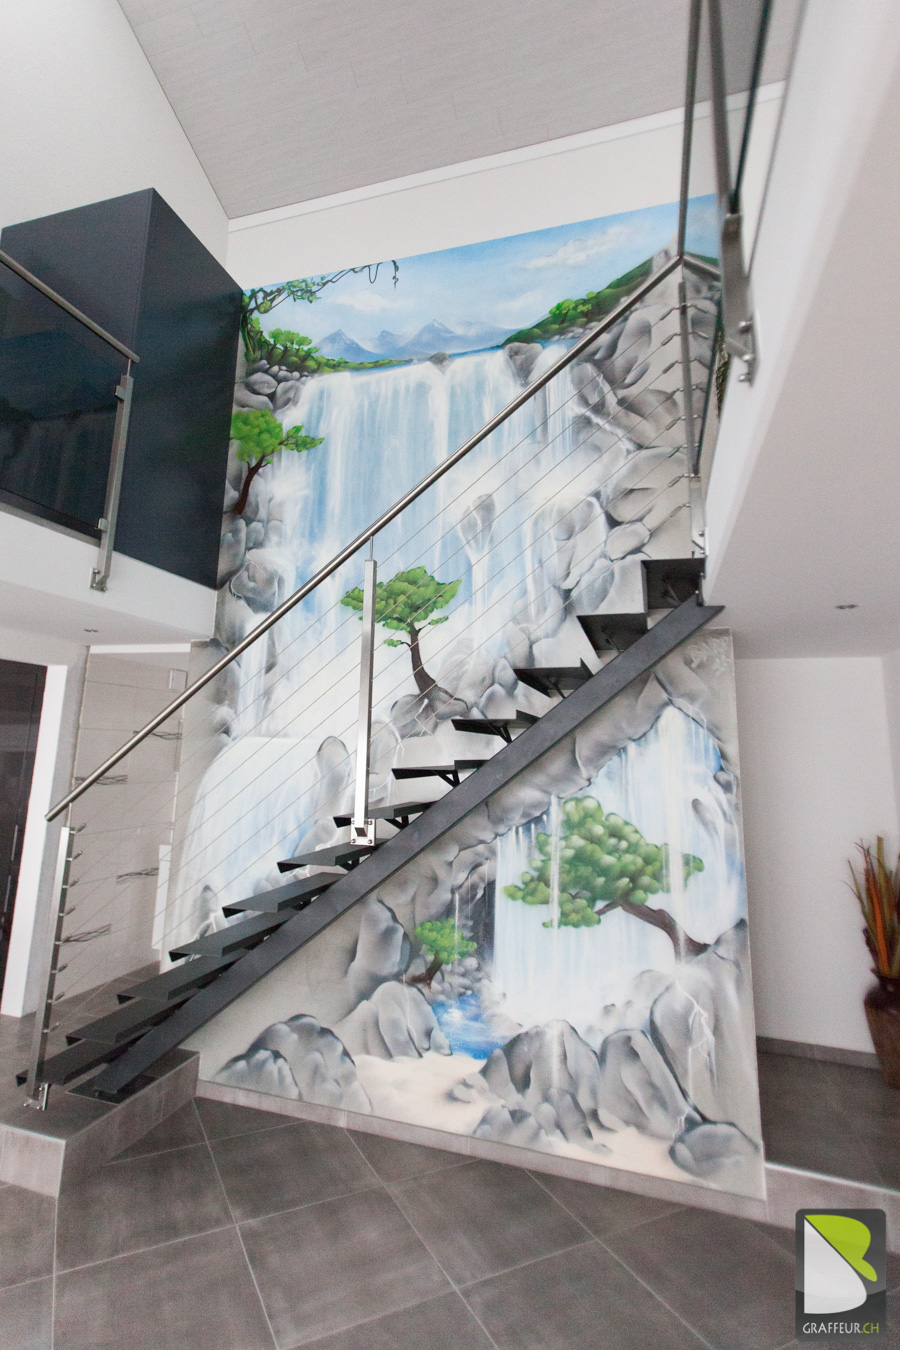 Cascade interieur à st croix baro graffiti artist suisse